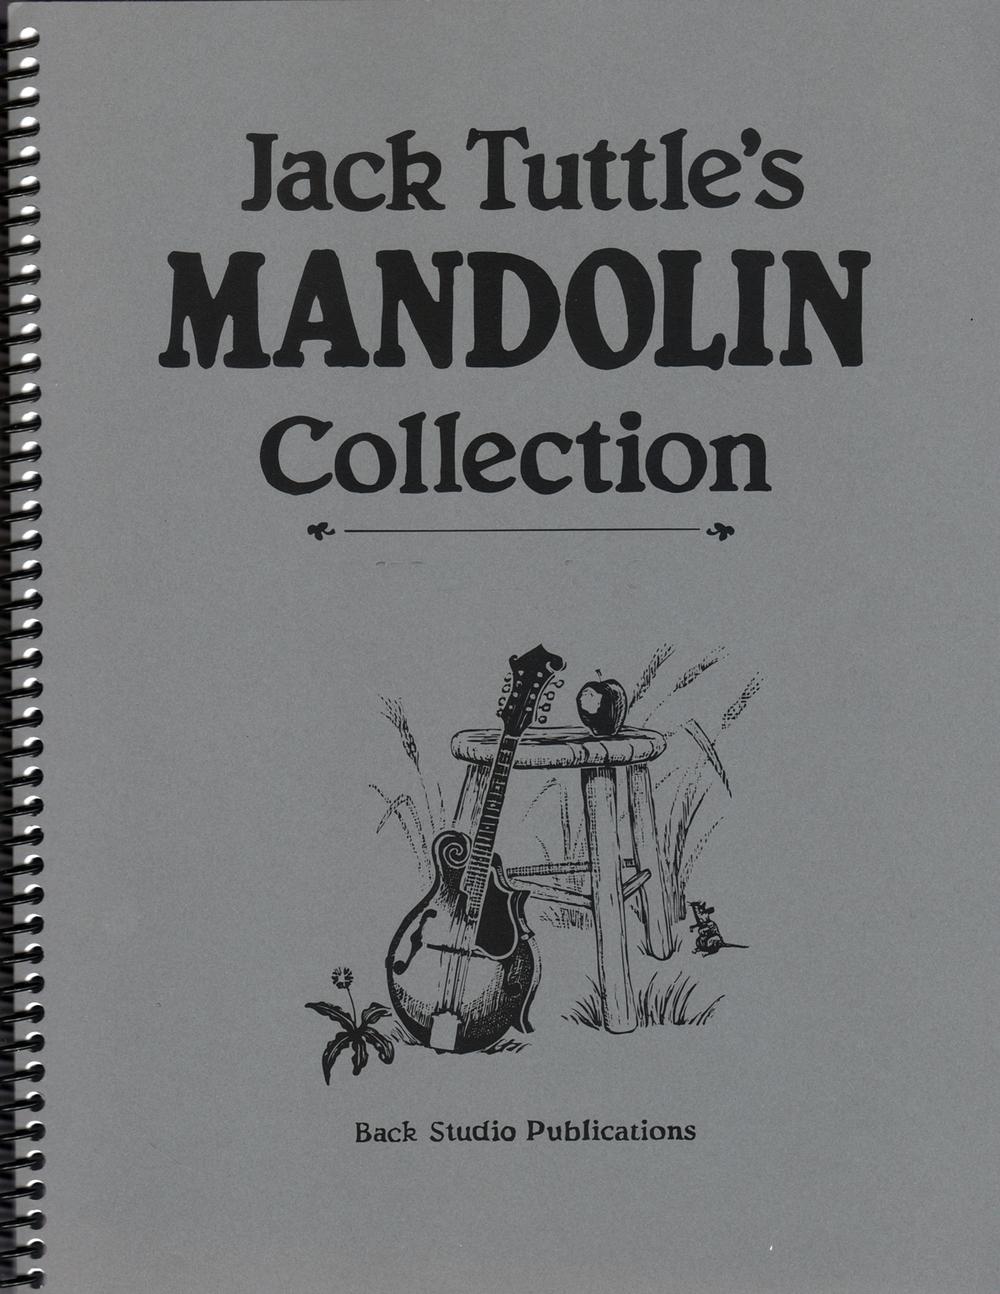 Jack Tuttle's Mandolin Collection, Vol. 2